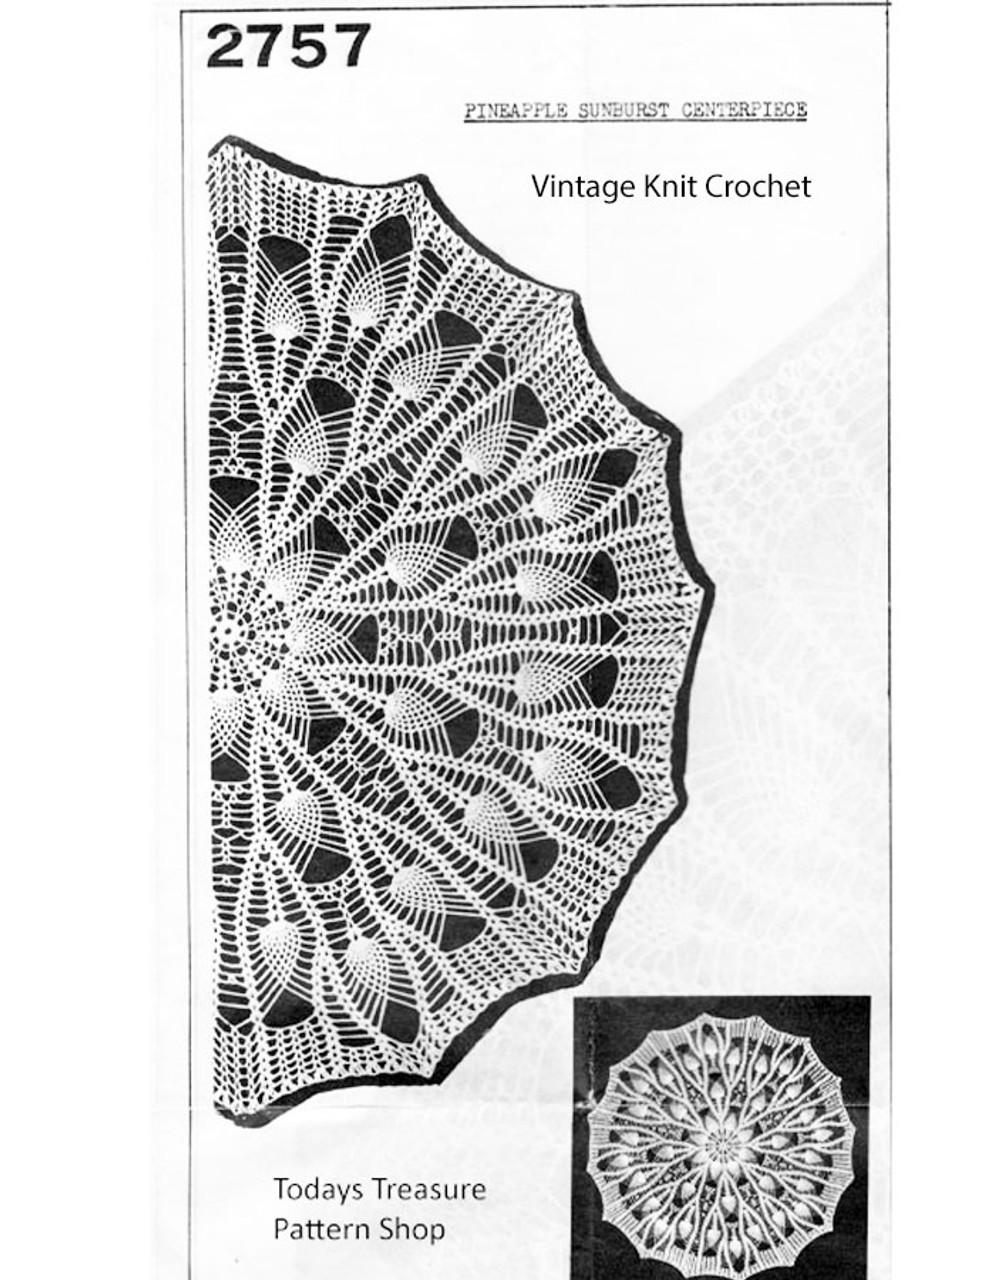 Pineapple Centerpiece Doily pattern, Anne Cabot 2757